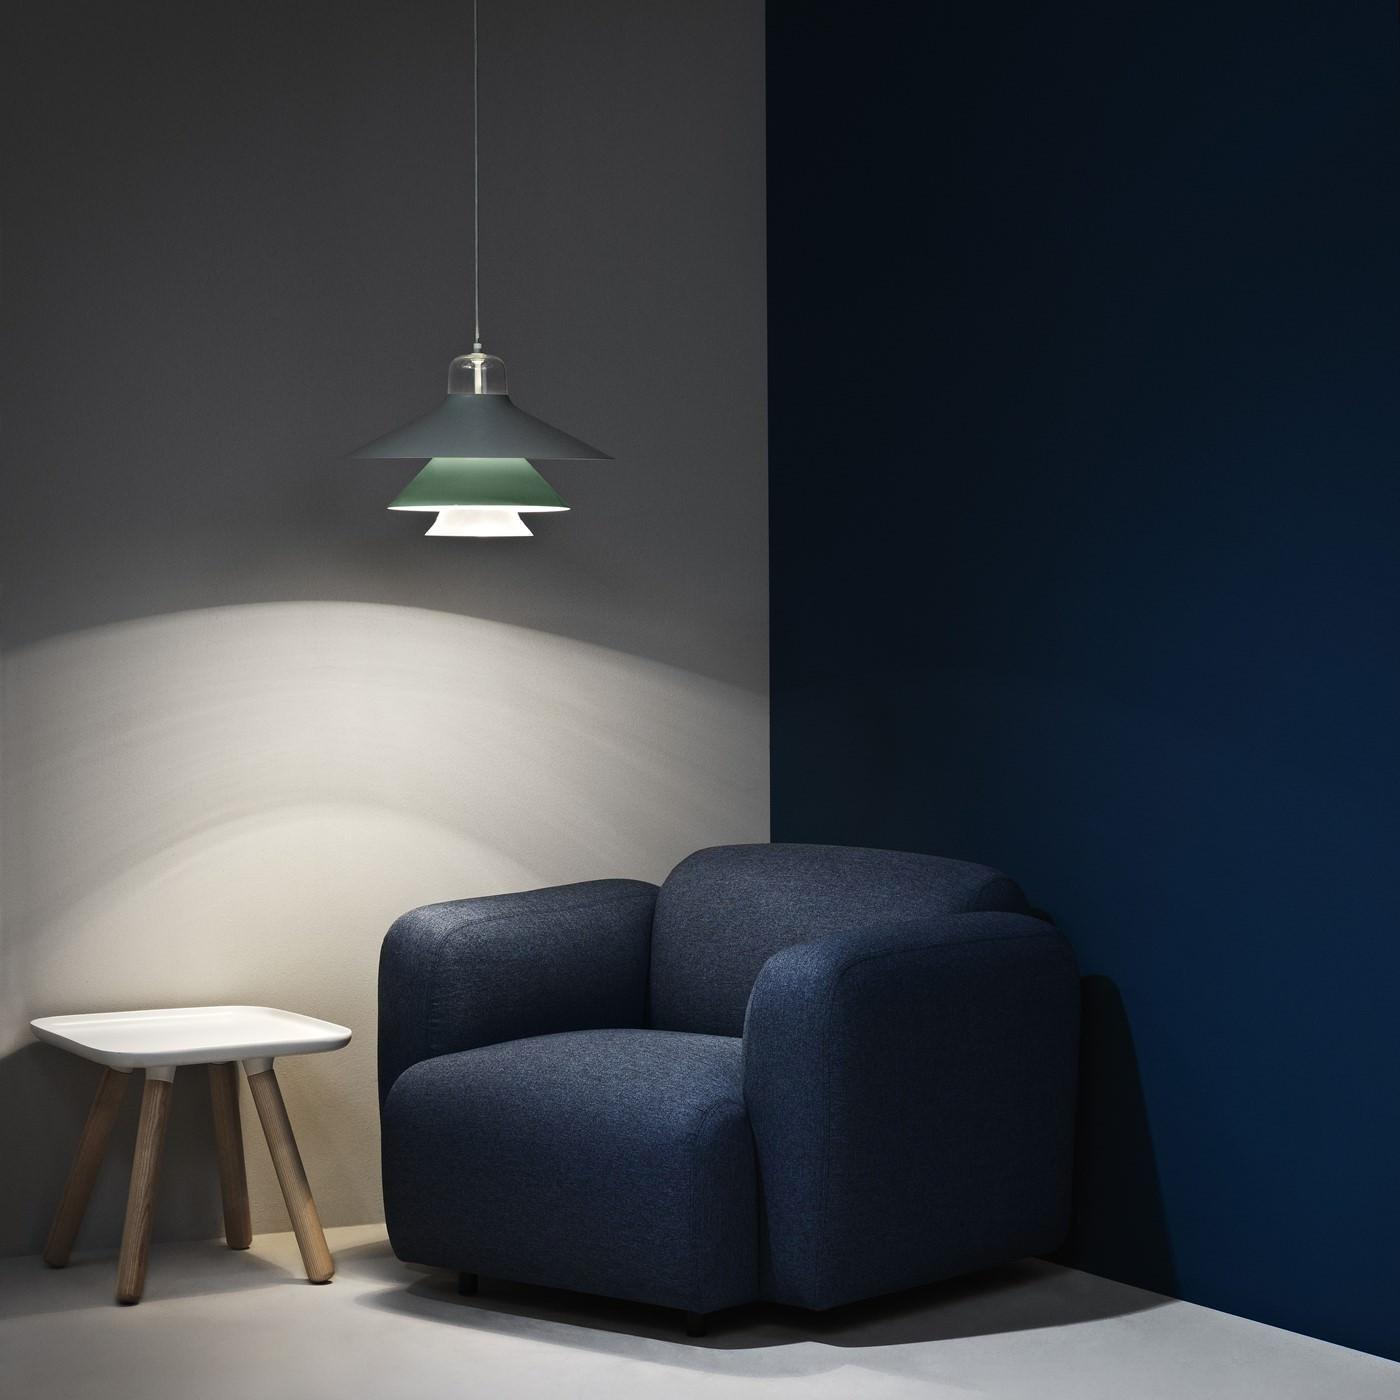 ikono lamp large normann copenhagen design is this. Black Bedroom Furniture Sets. Home Design Ideas